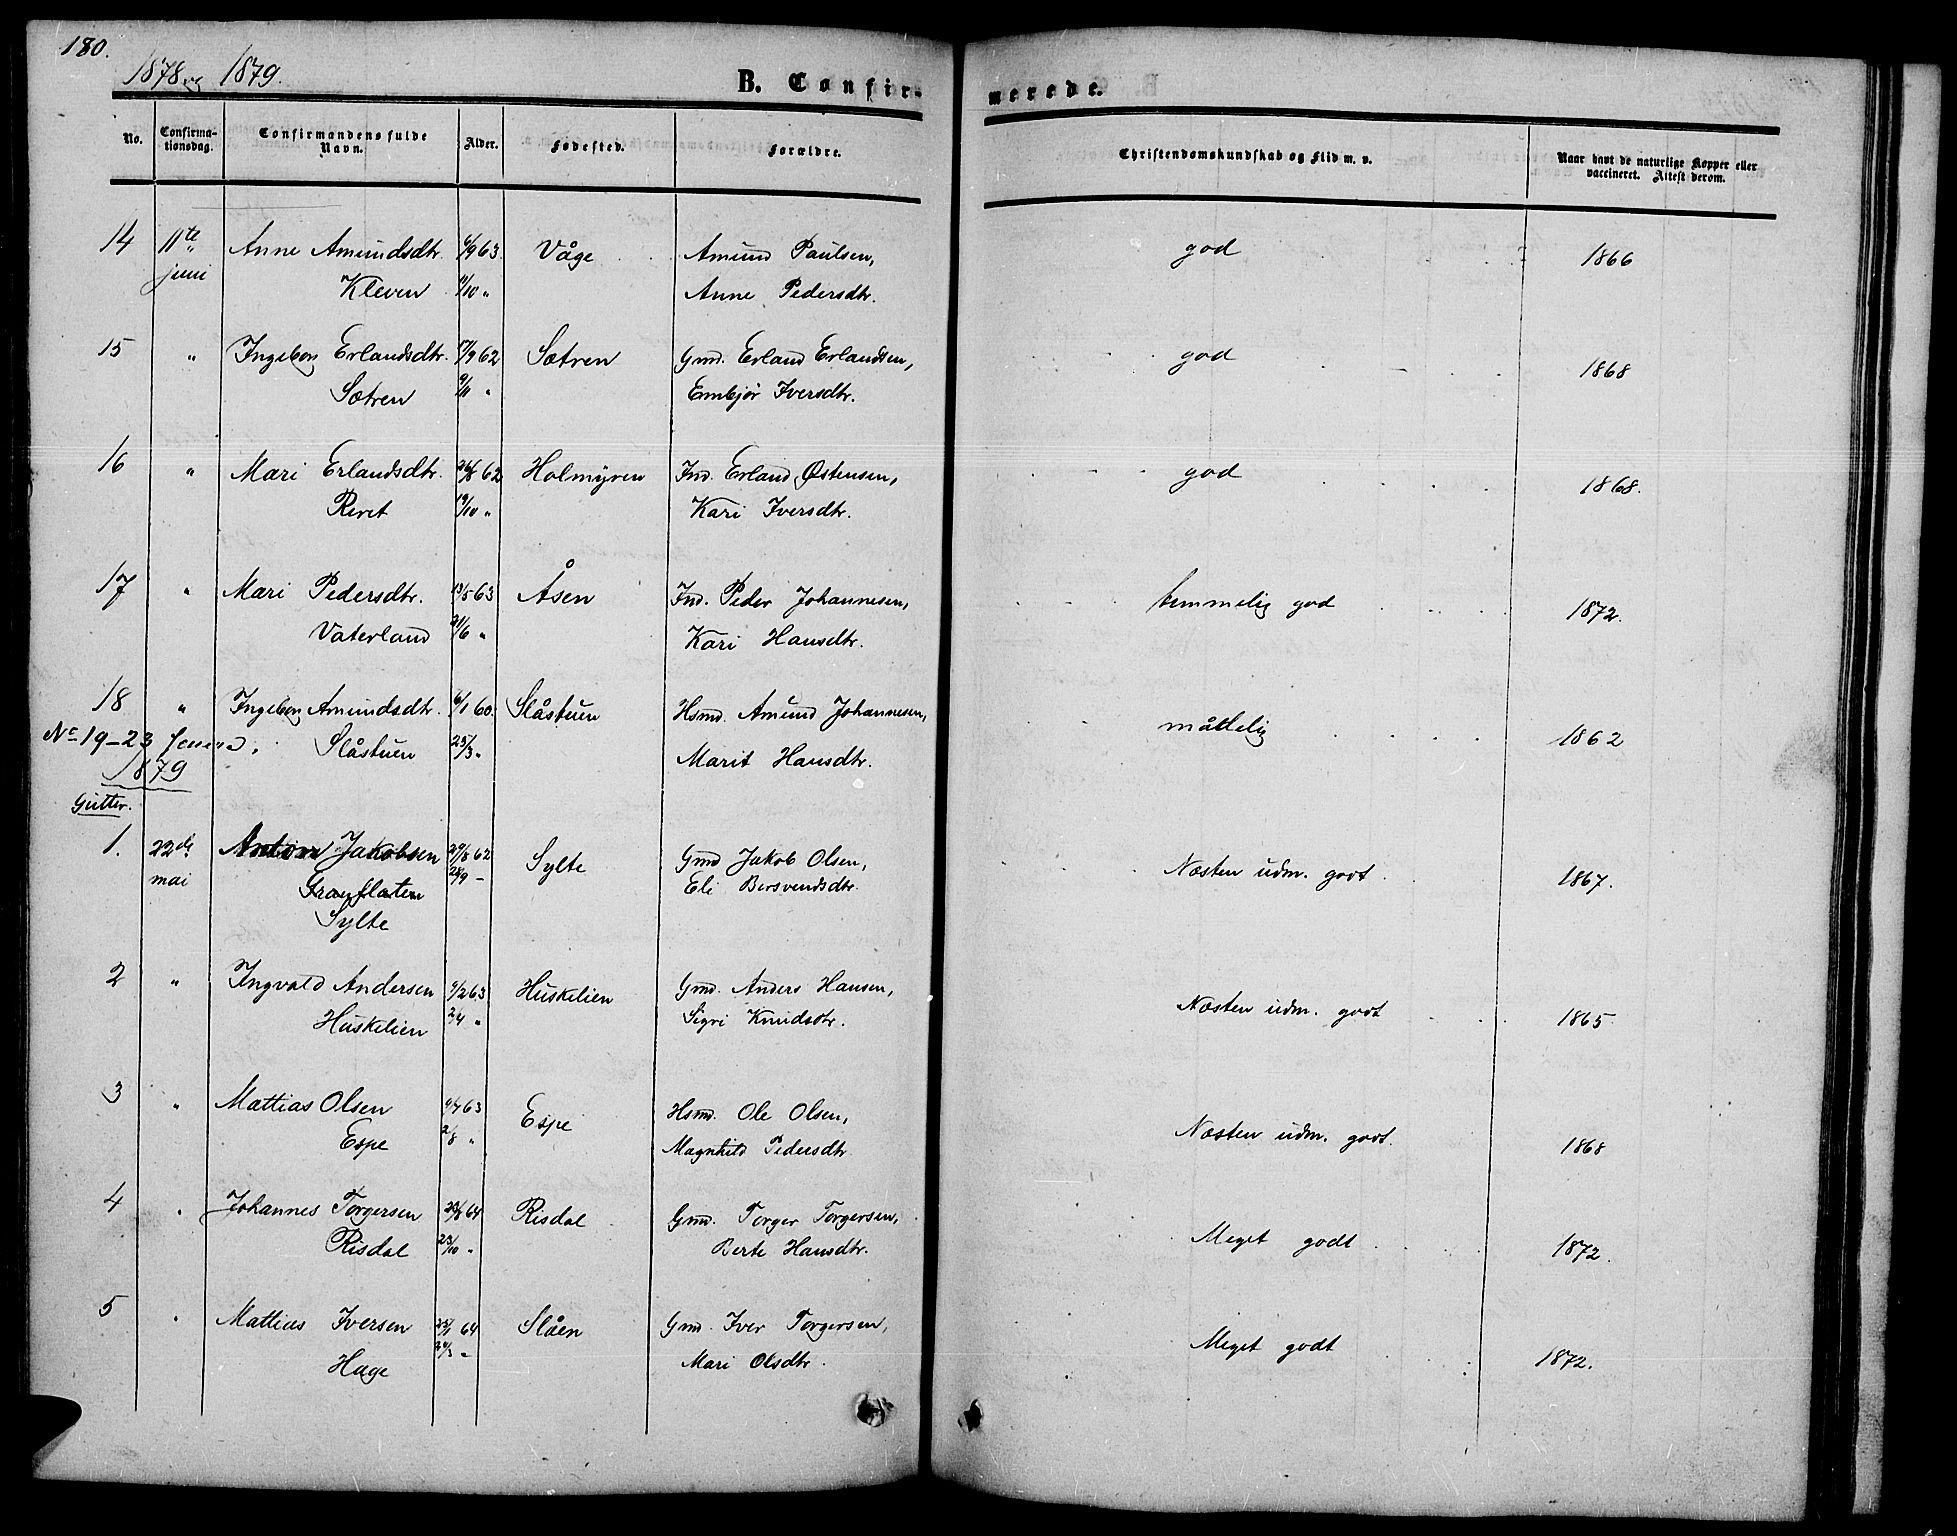 SAH, Nord-Fron prestekontor, Klokkerbok nr. 2, 1851-1883, s. 180